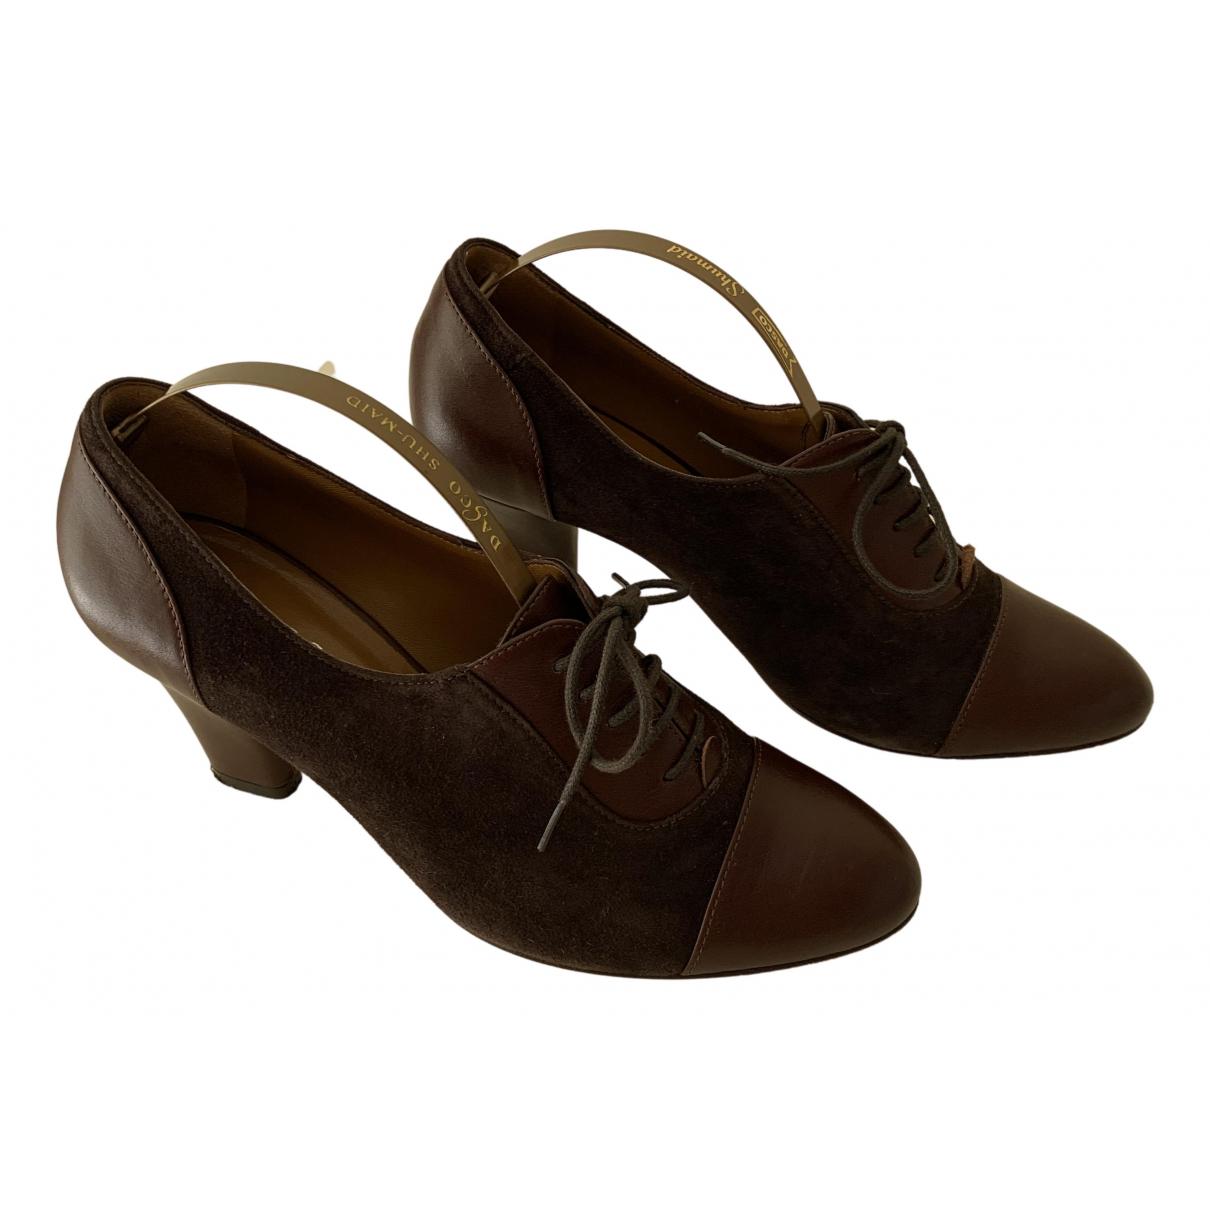 Hobbs - Derbies   pour femme en cuir - marron